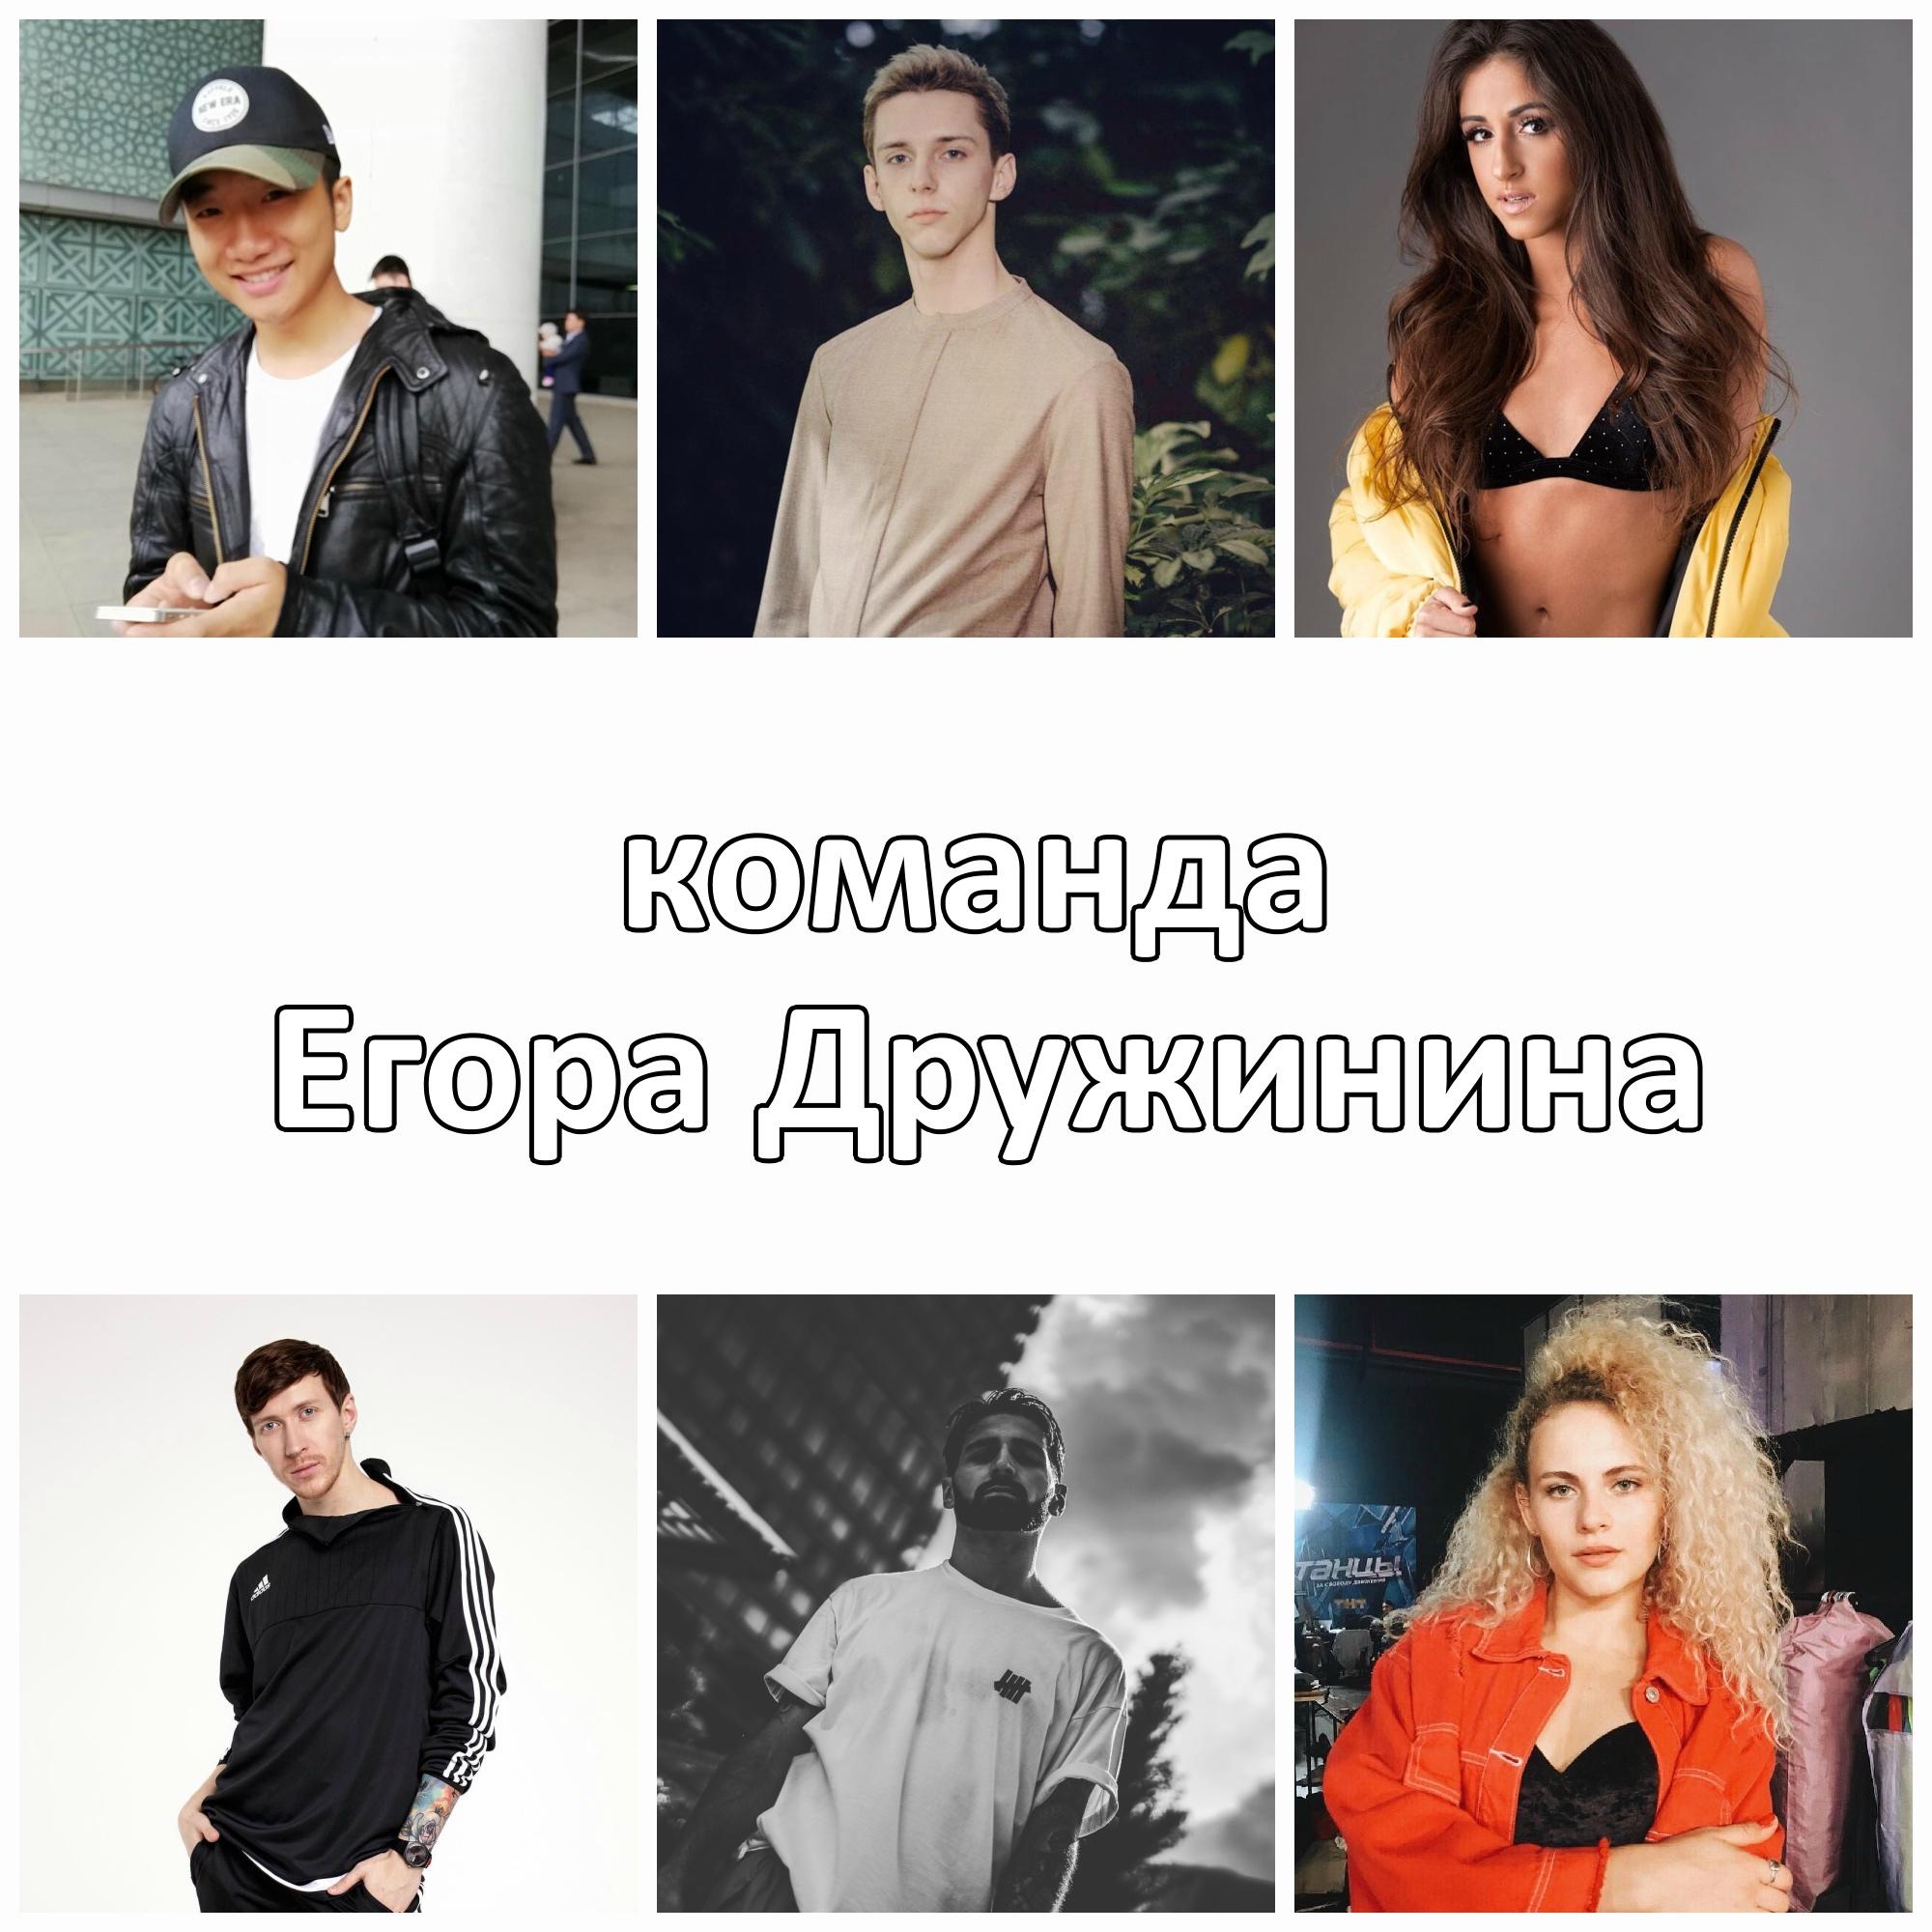 Танцы на ТНТ 5 сезон команда Егора Дружинина